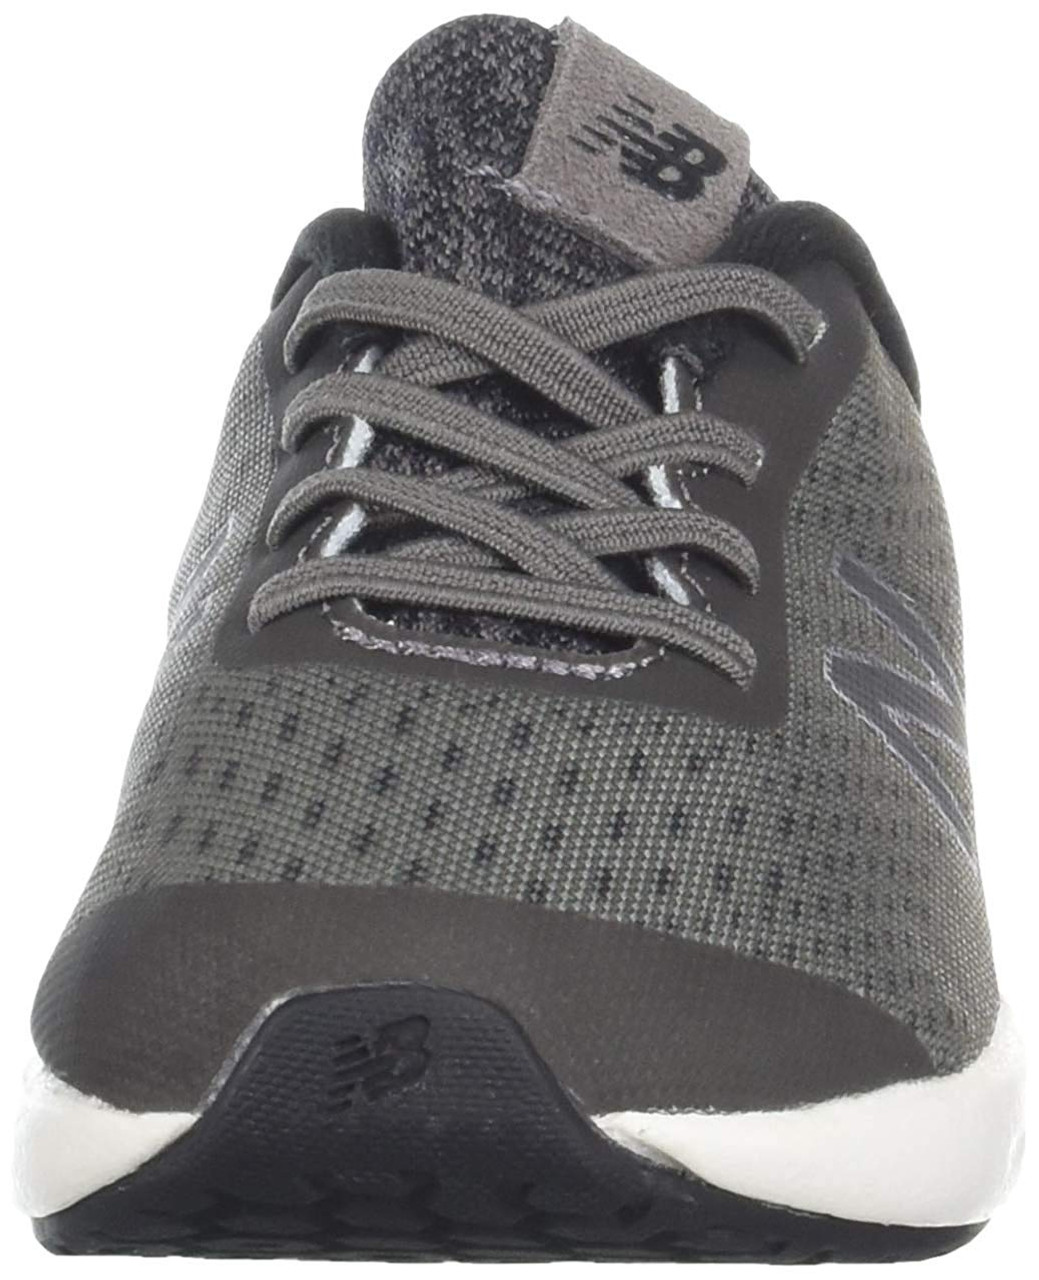 New Balance Baby Boy Kvarndgi Lace Up Sneakers